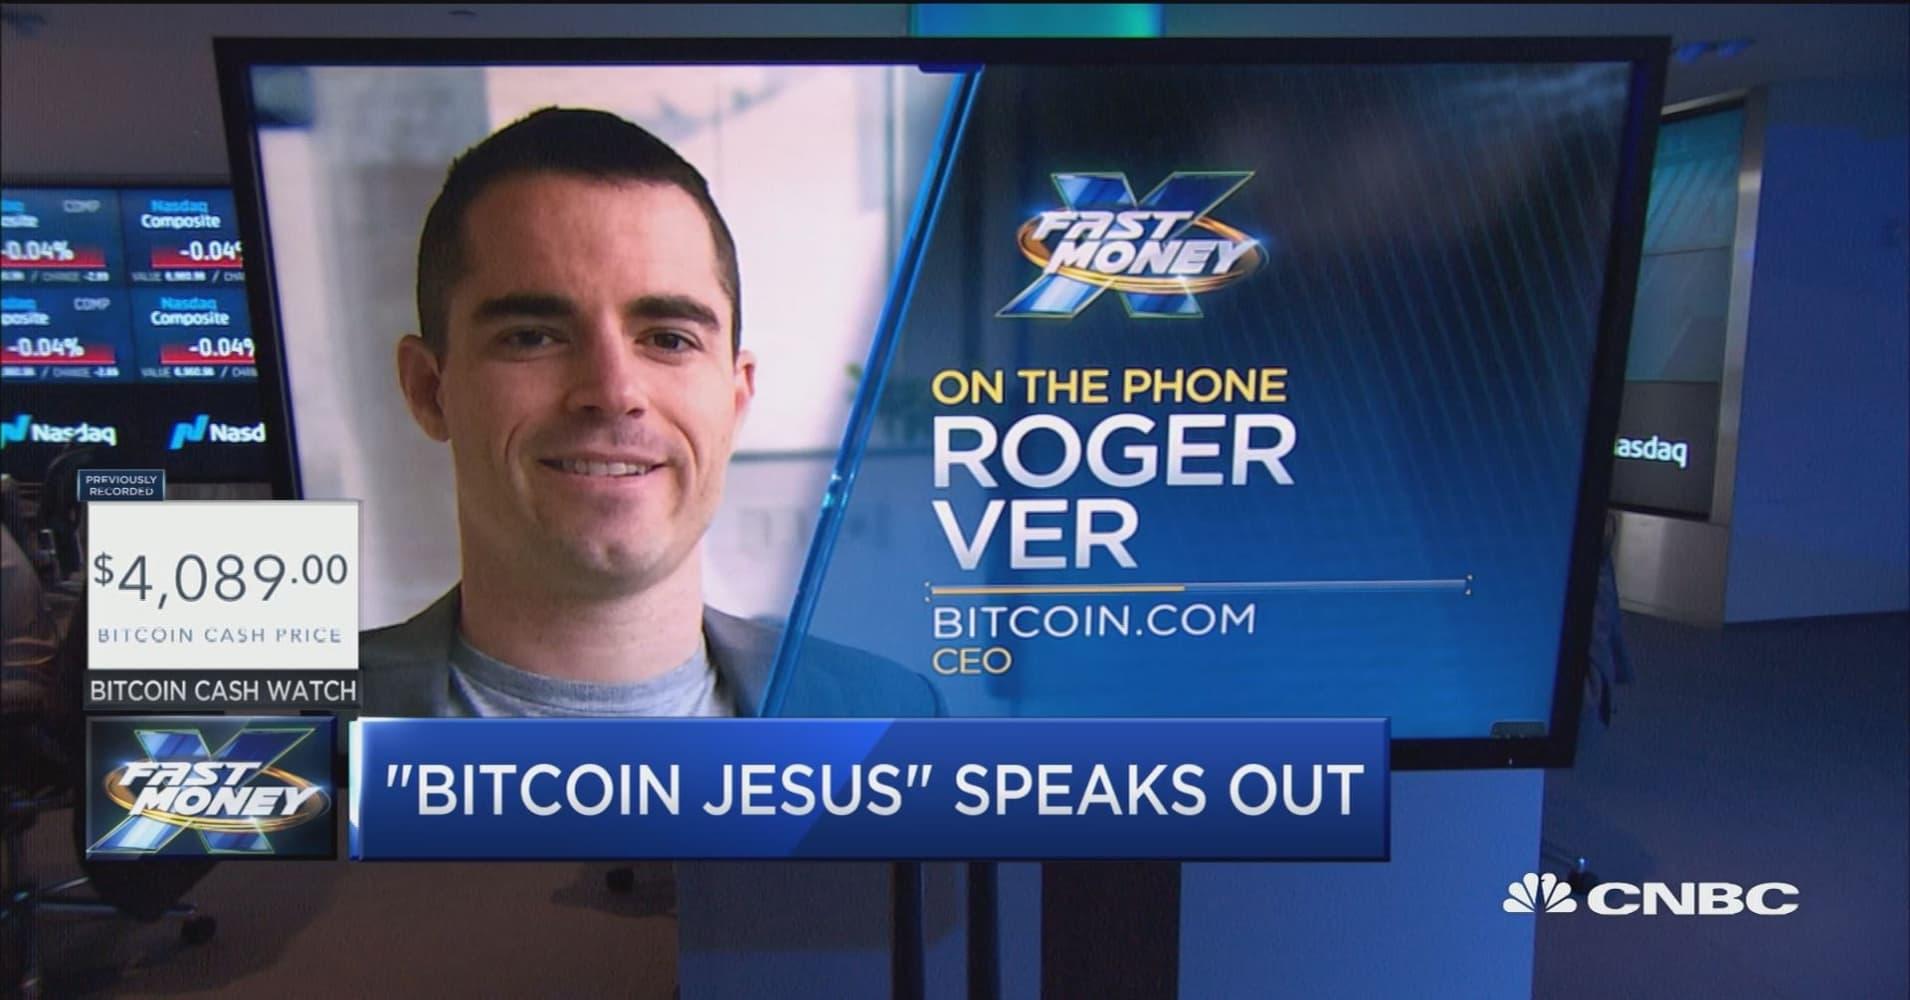 Hd moore bitcoin mining